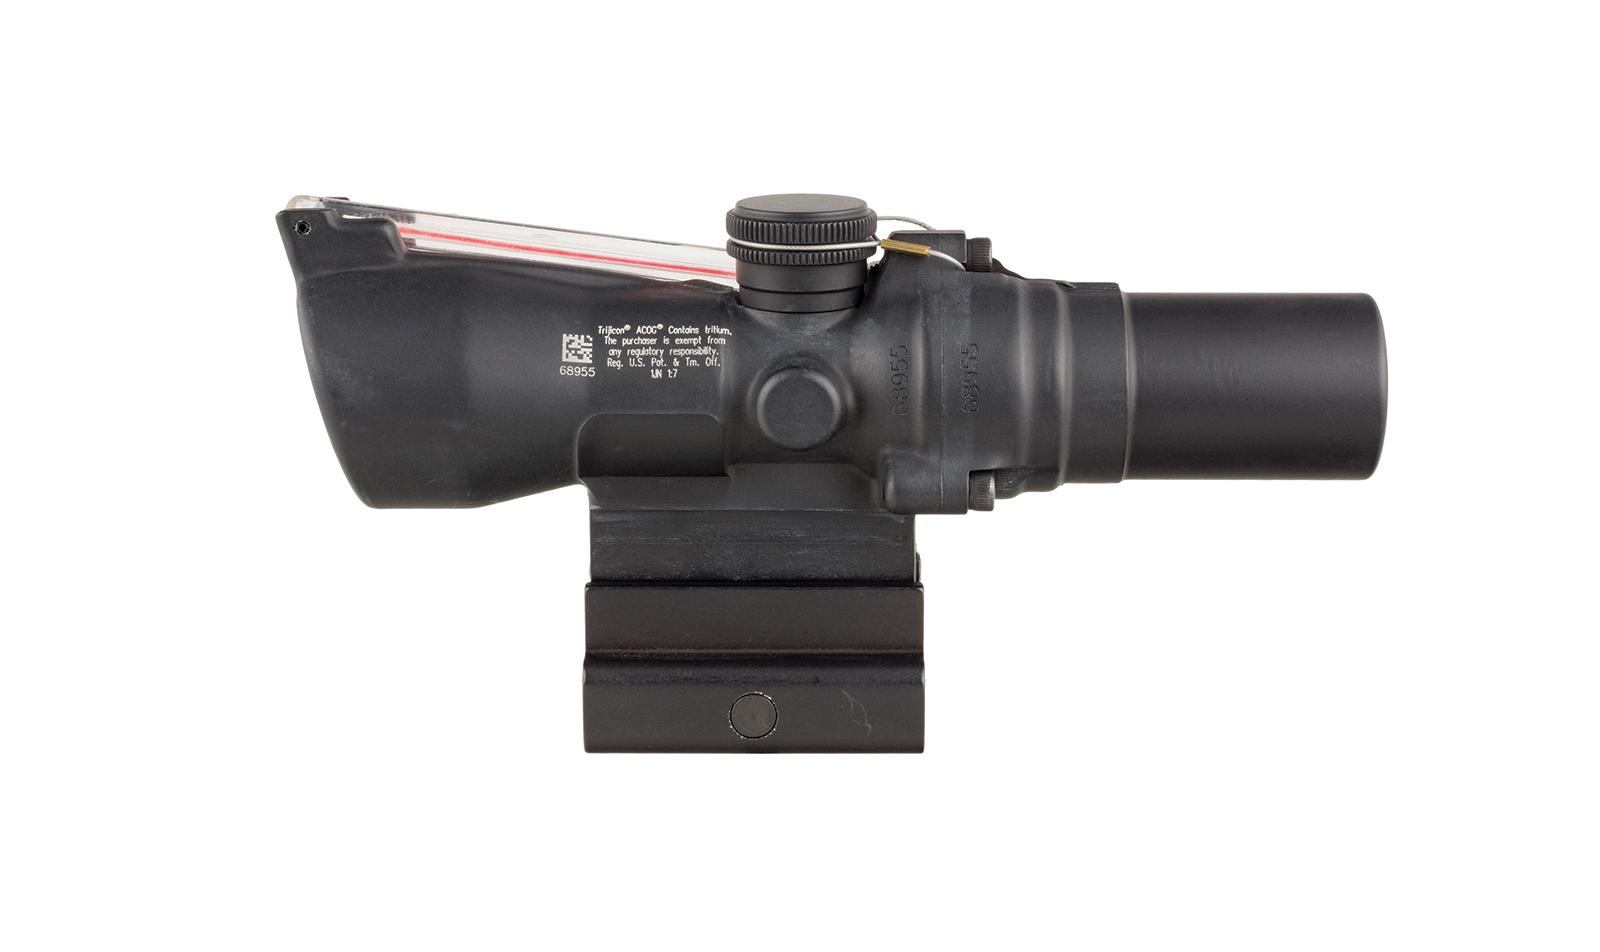 TA45-C-400156 angle 2